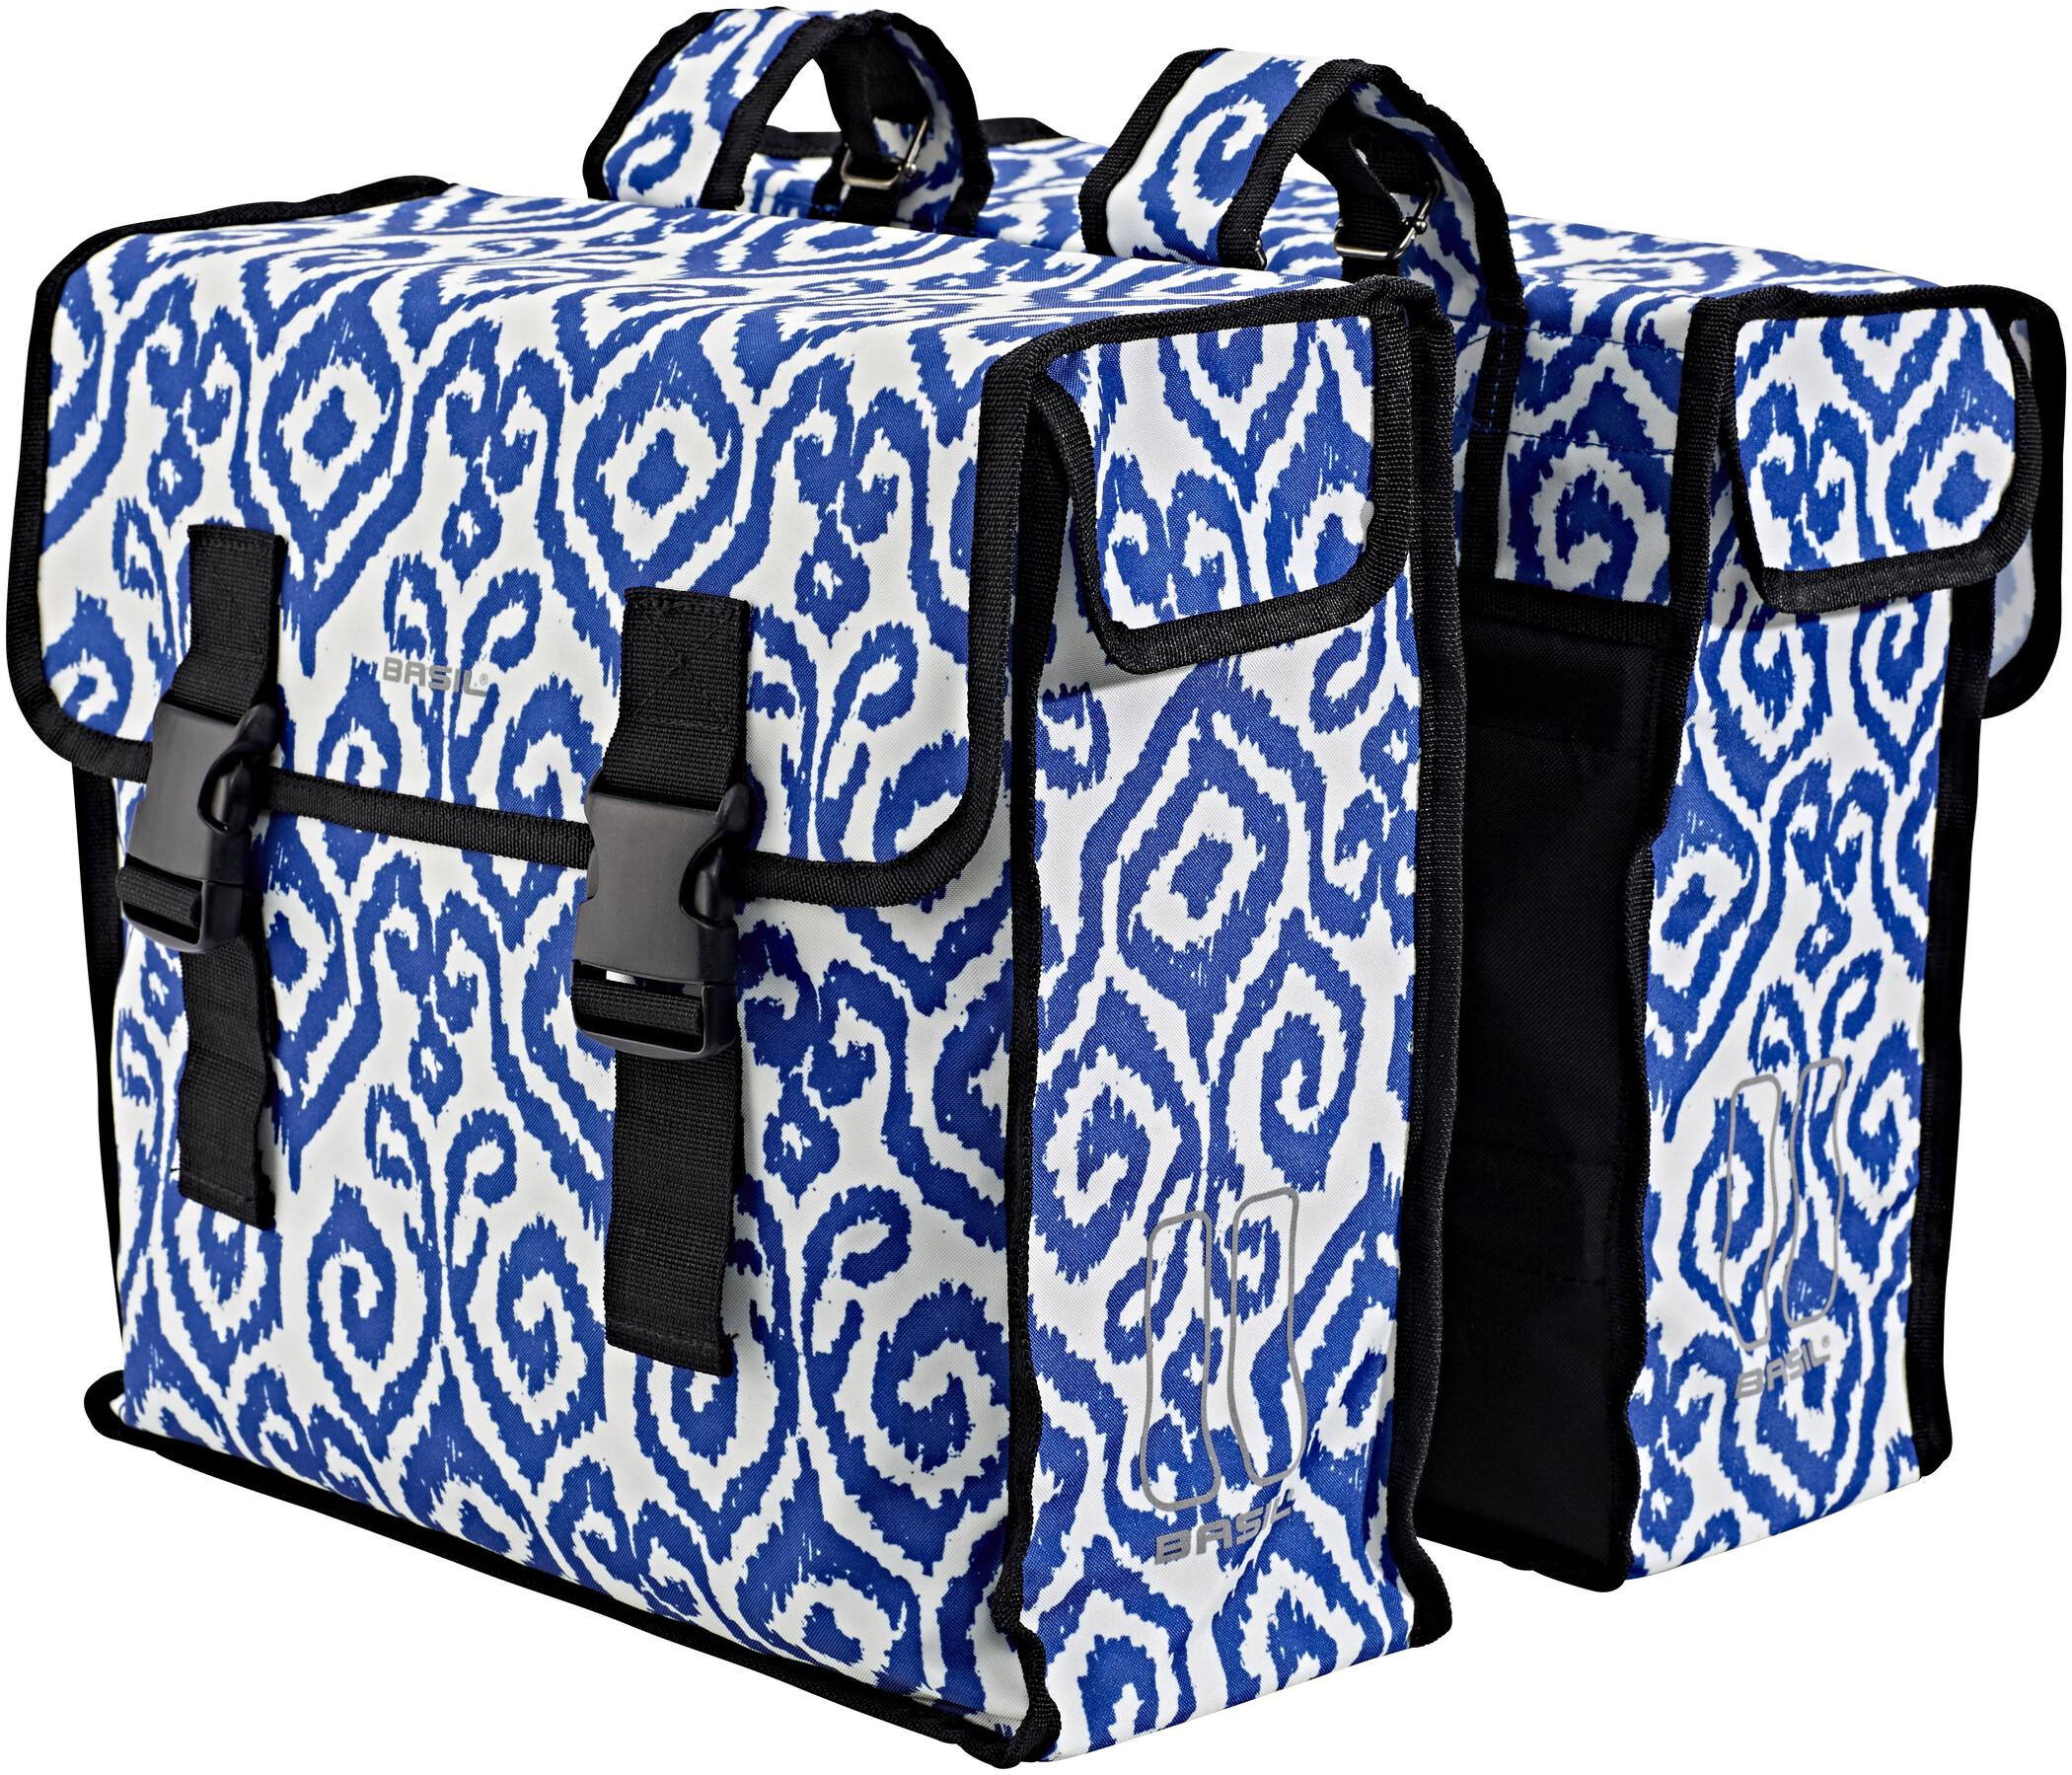 Basil Mara XL Sidetasker L, 35l, indigo ikat (2020) | Rack bags